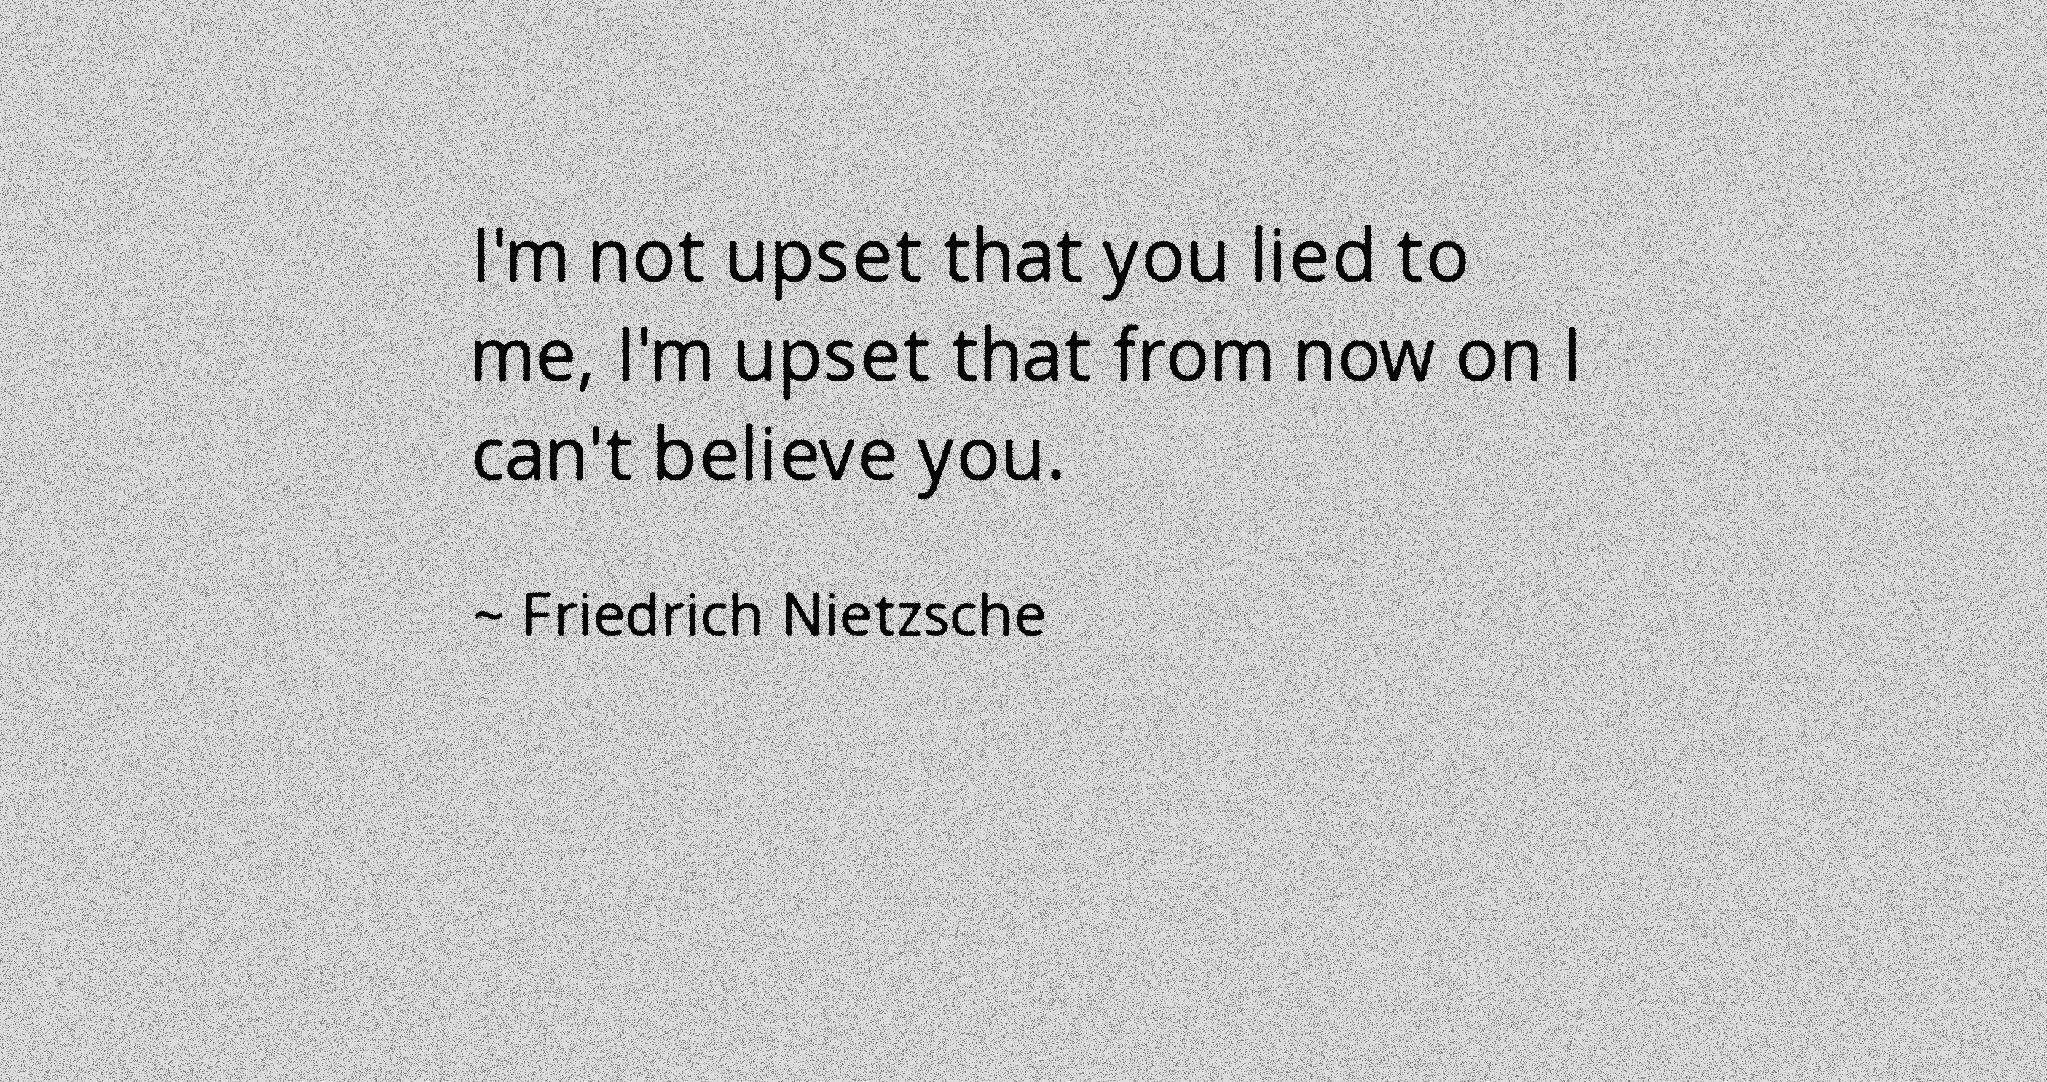 Nietzsche Quotes Fascinating Friedrich Nietzsche  Words Of Wisdom  Pinterest  Friedrich